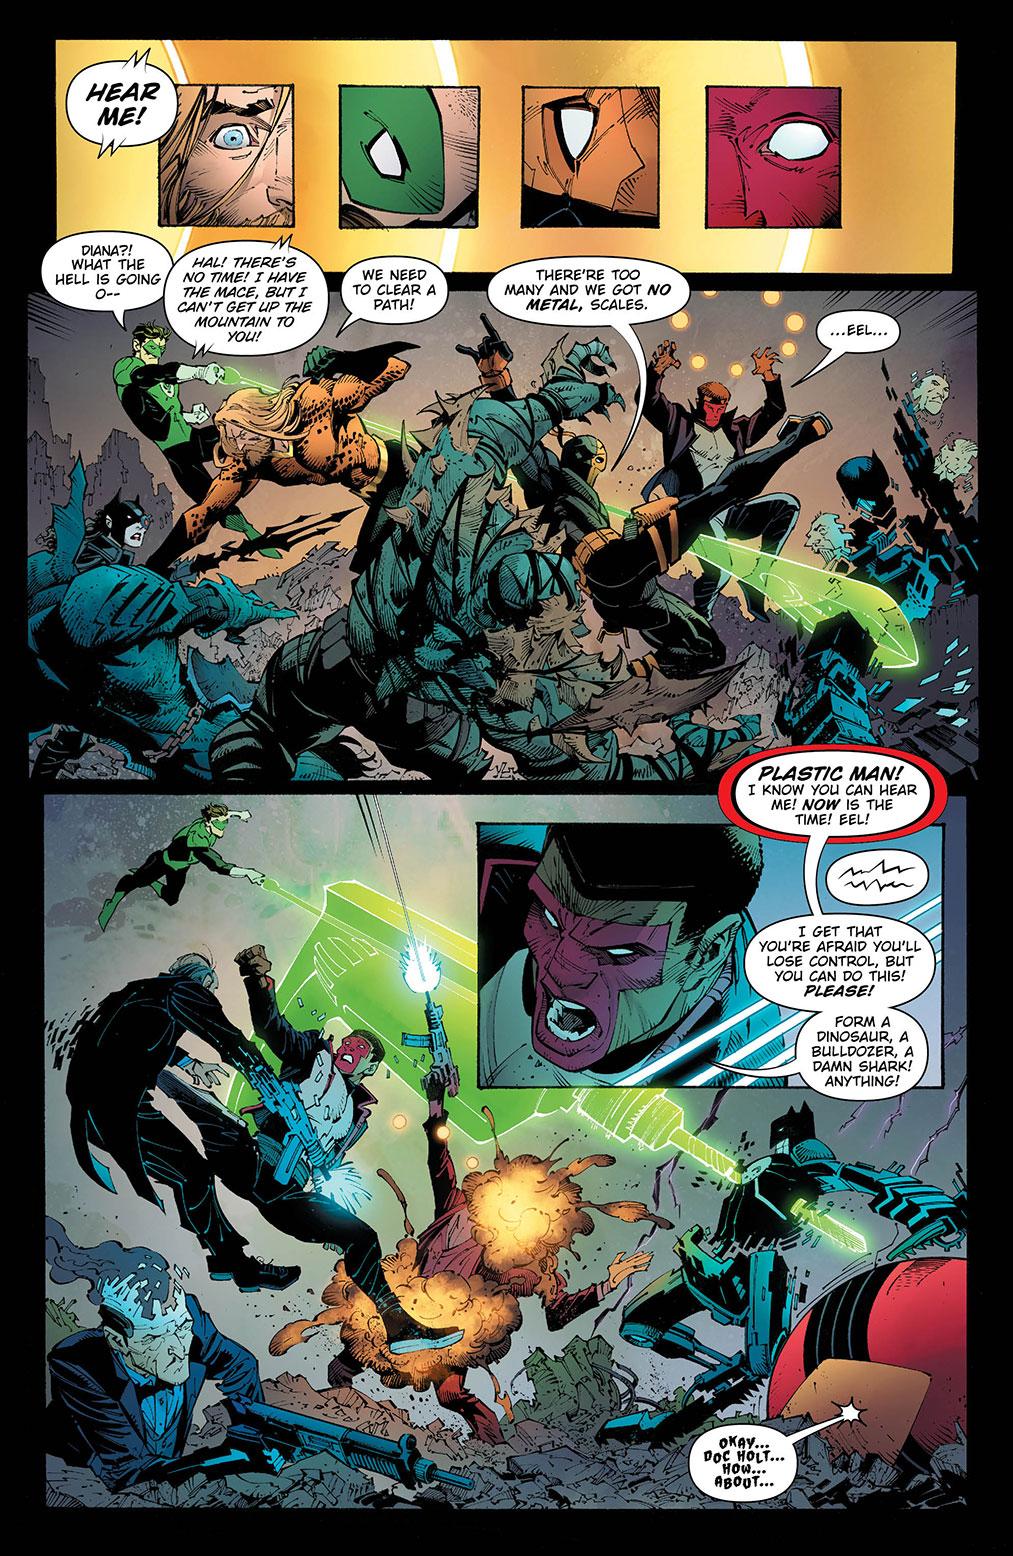 Dark Nights Metal 6_5 - DC Comics News